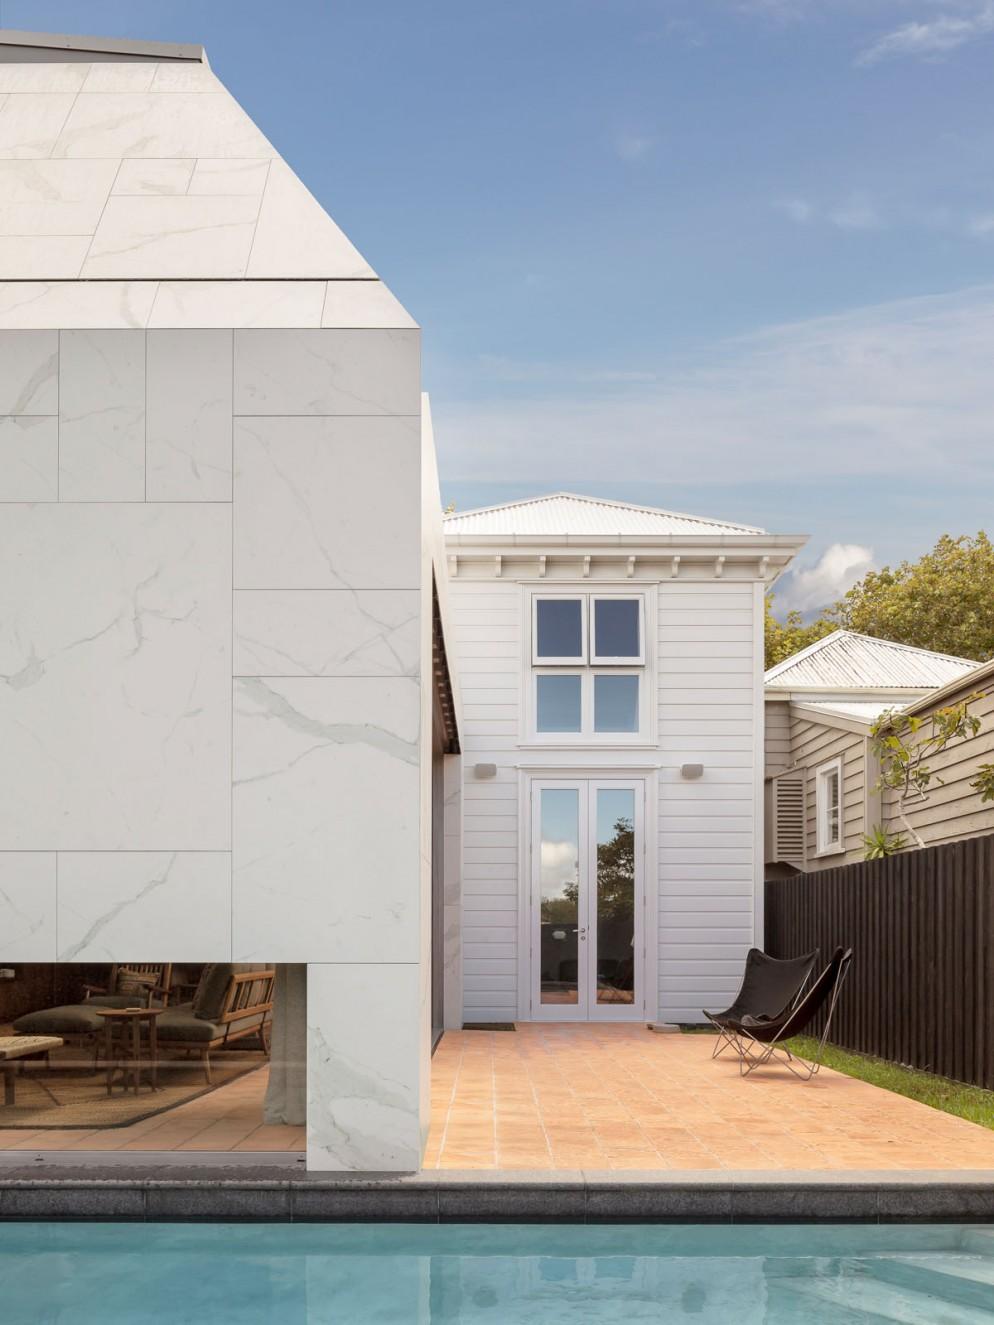 casa-nuova-zelanda-katie-lockhart07